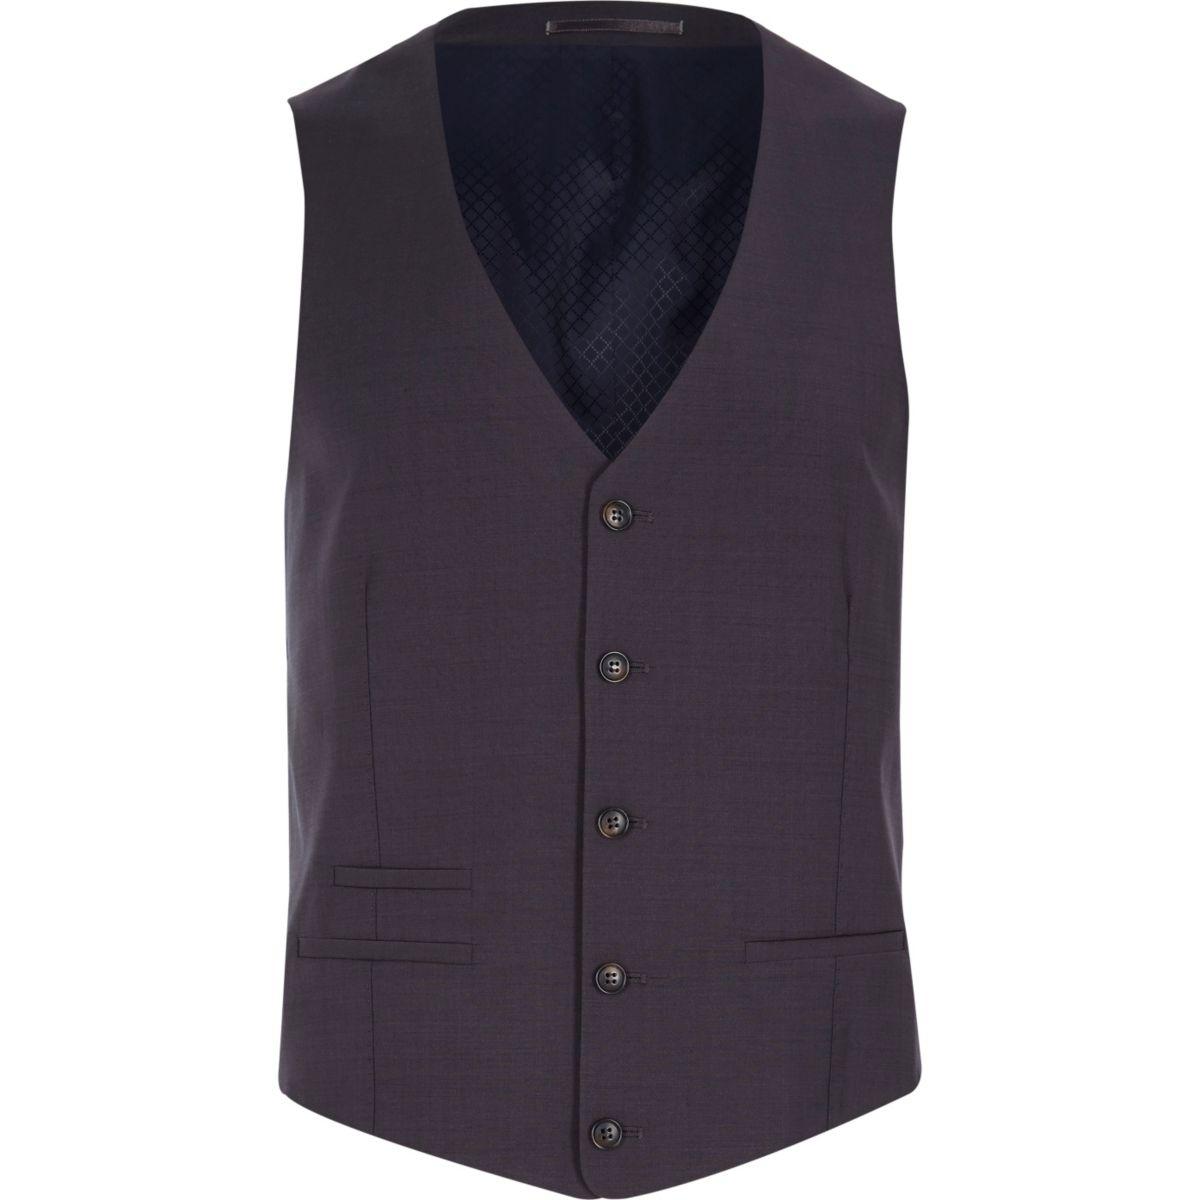 Grey wool-blend button front vest